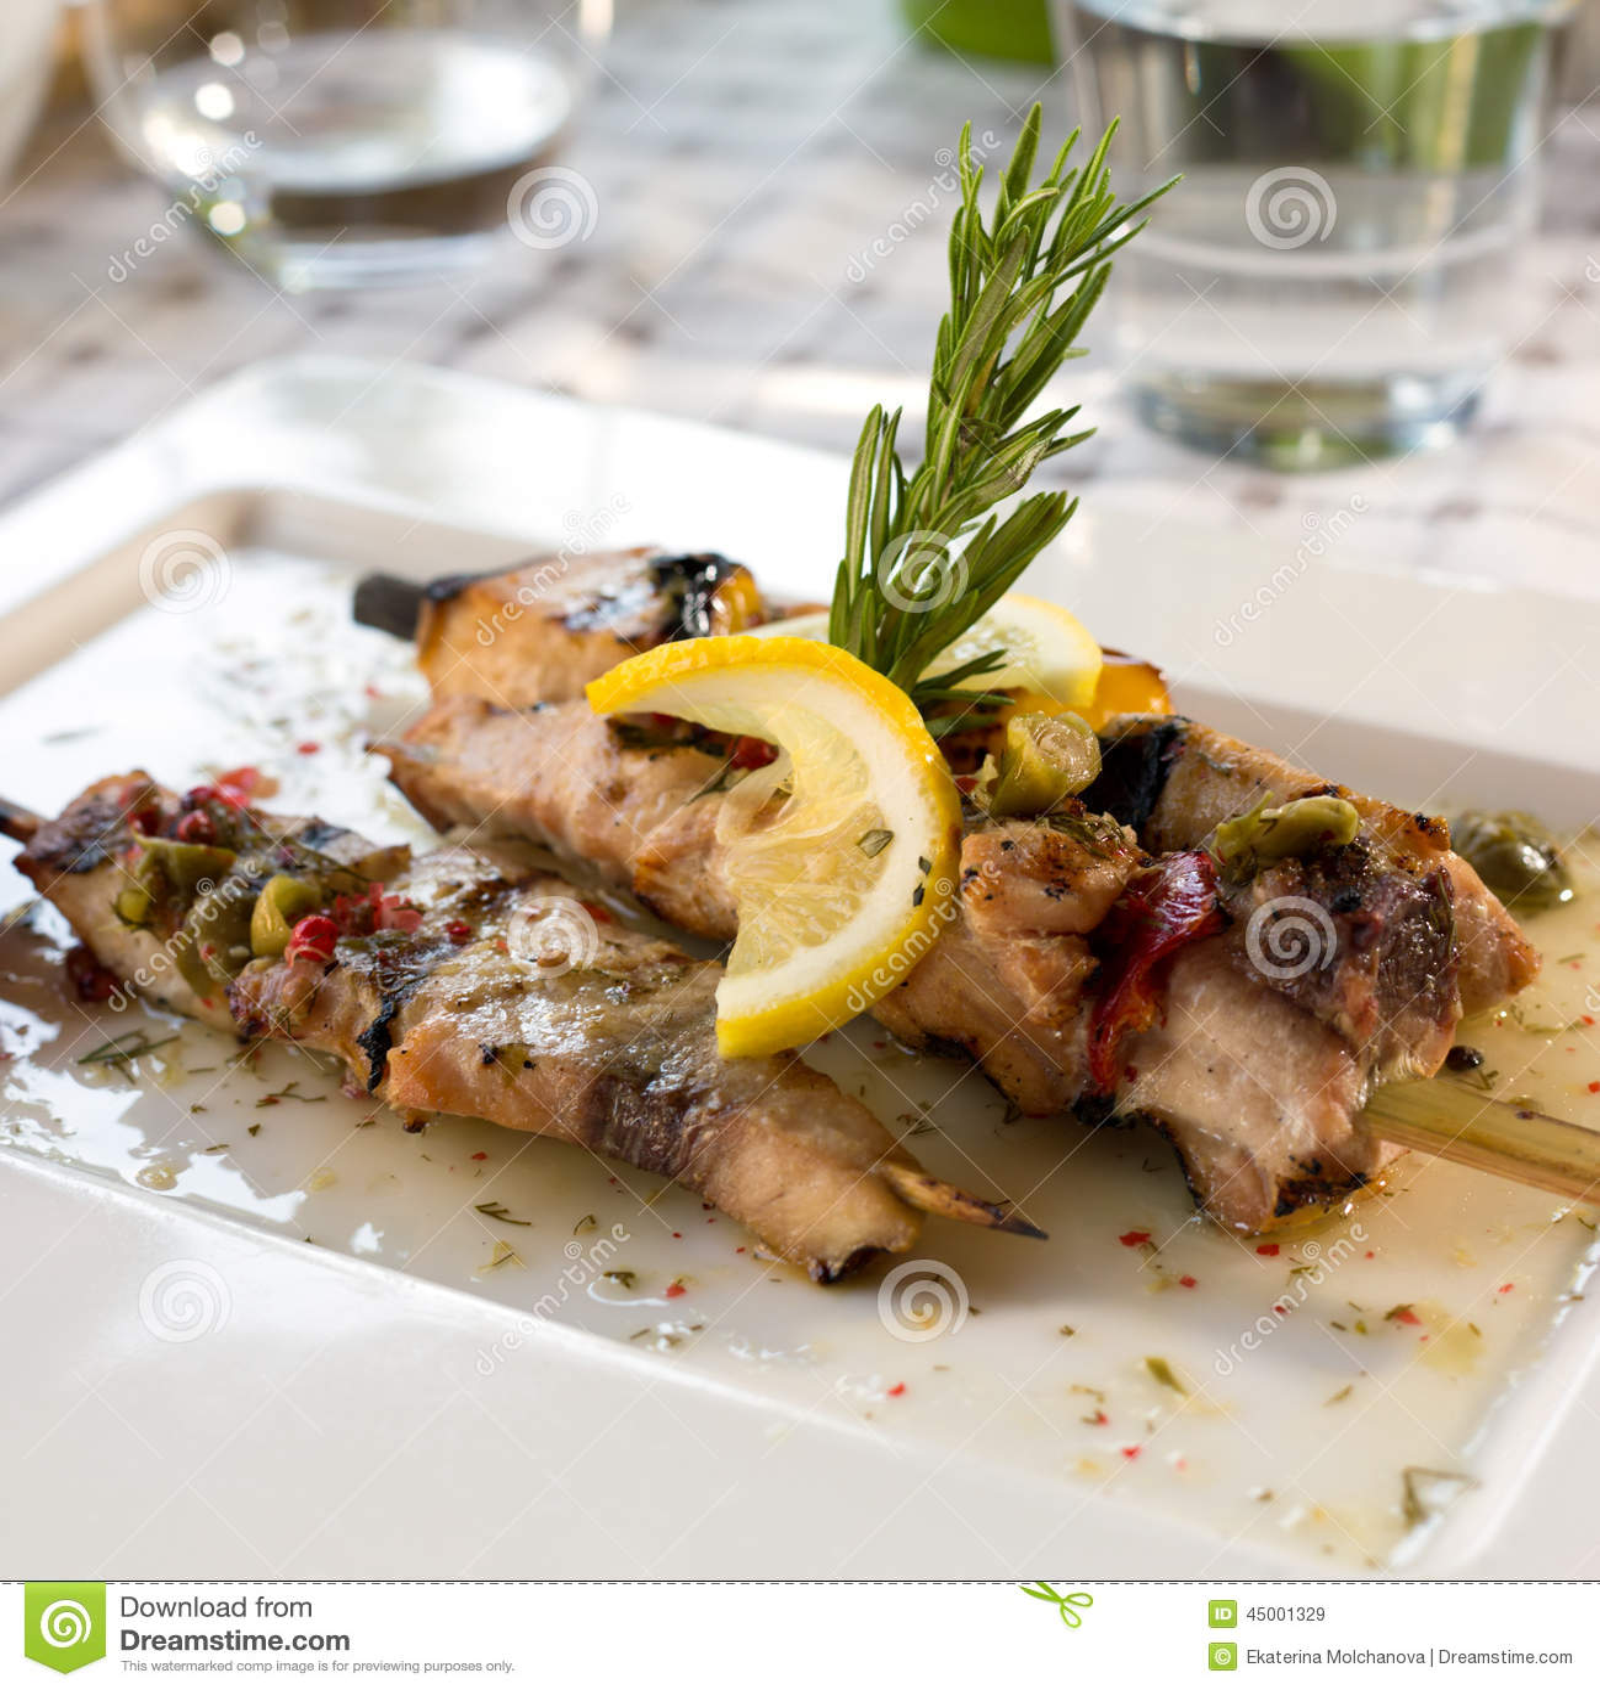 Swordfish Fillet Stock Photo - Image: 45001329